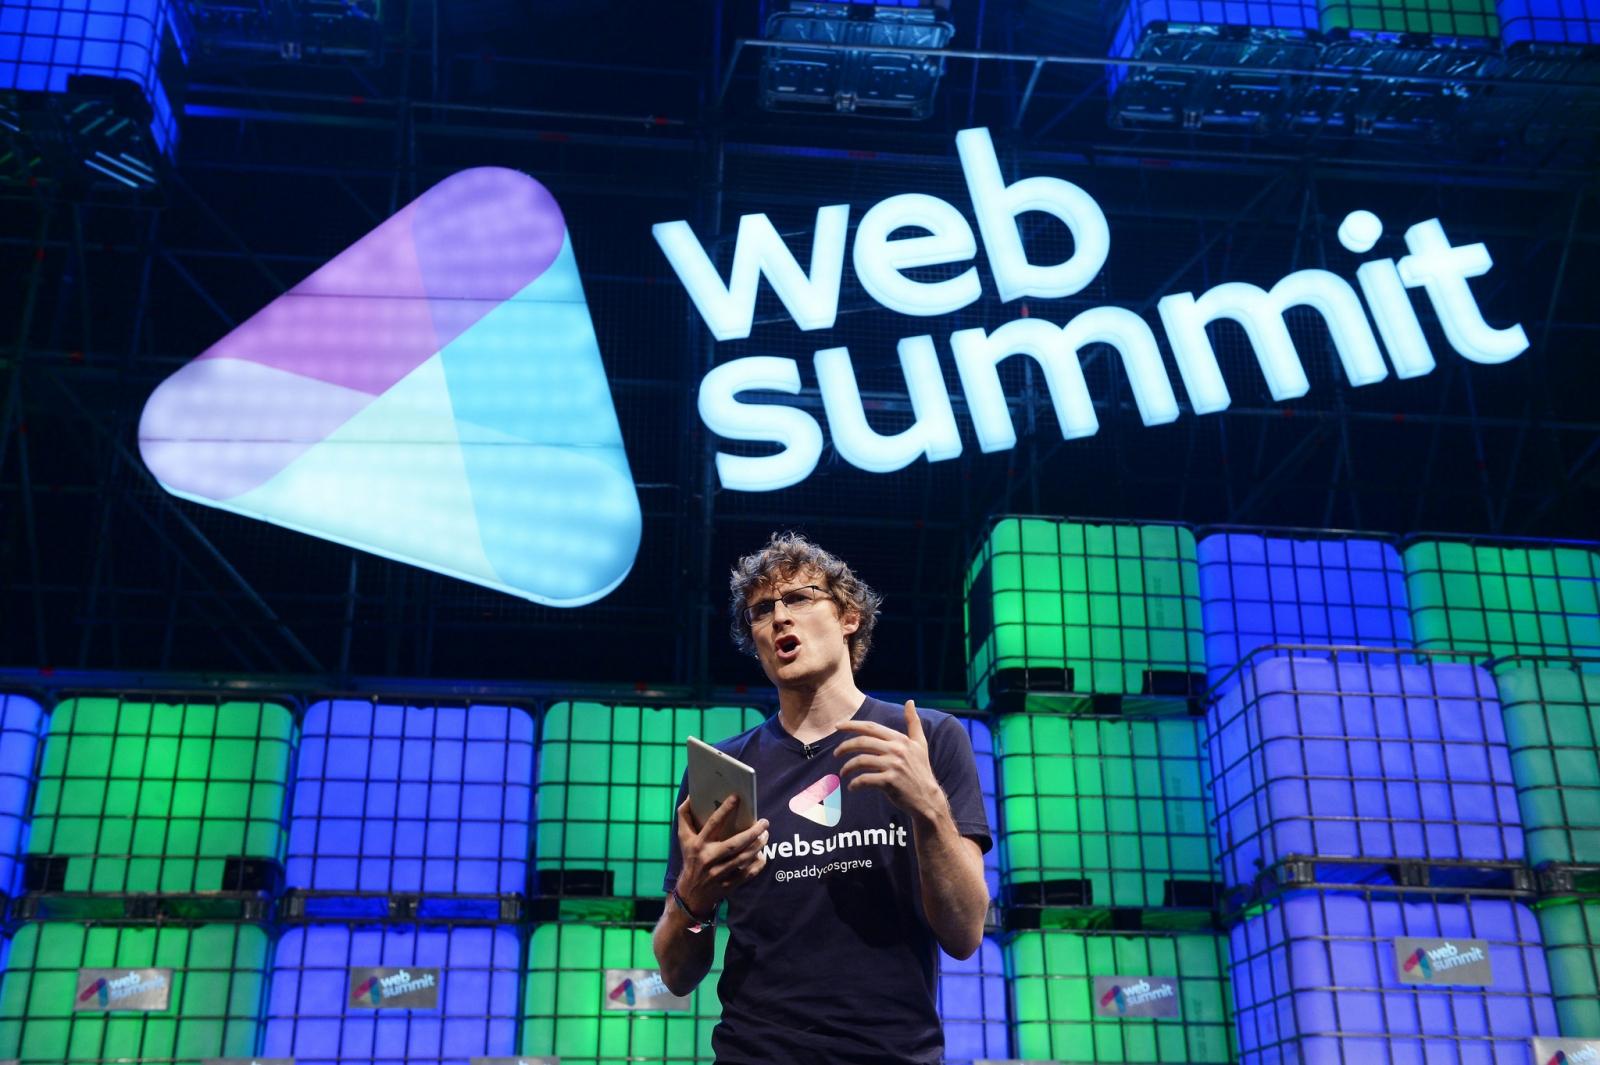 Web Summit 2014 Paddy Cosgrave WiFi